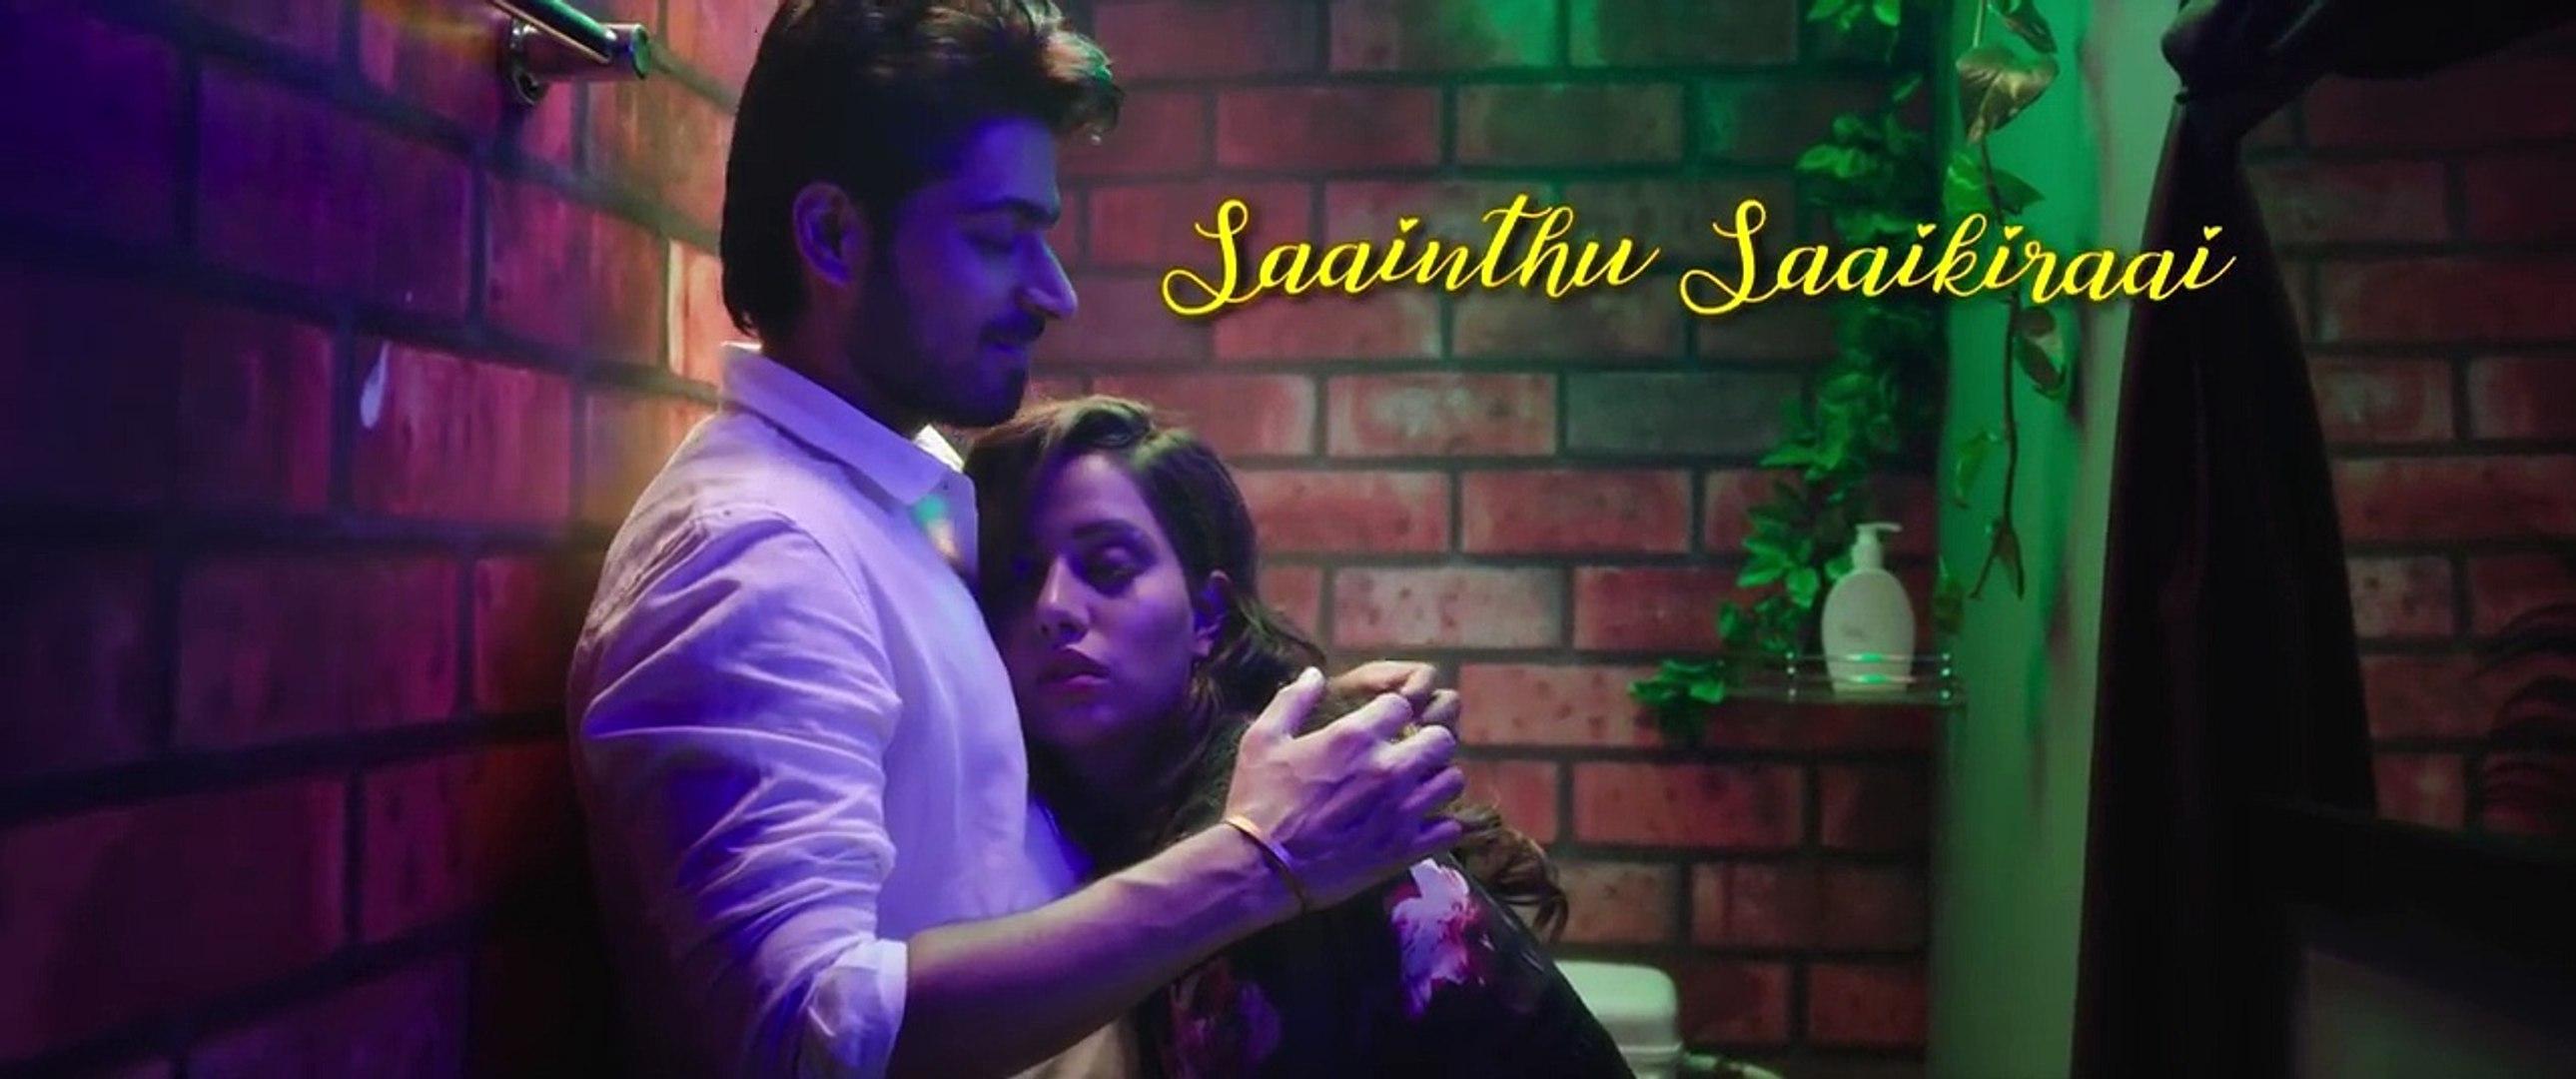 pyaar prema kaadhal high on love hd video song download